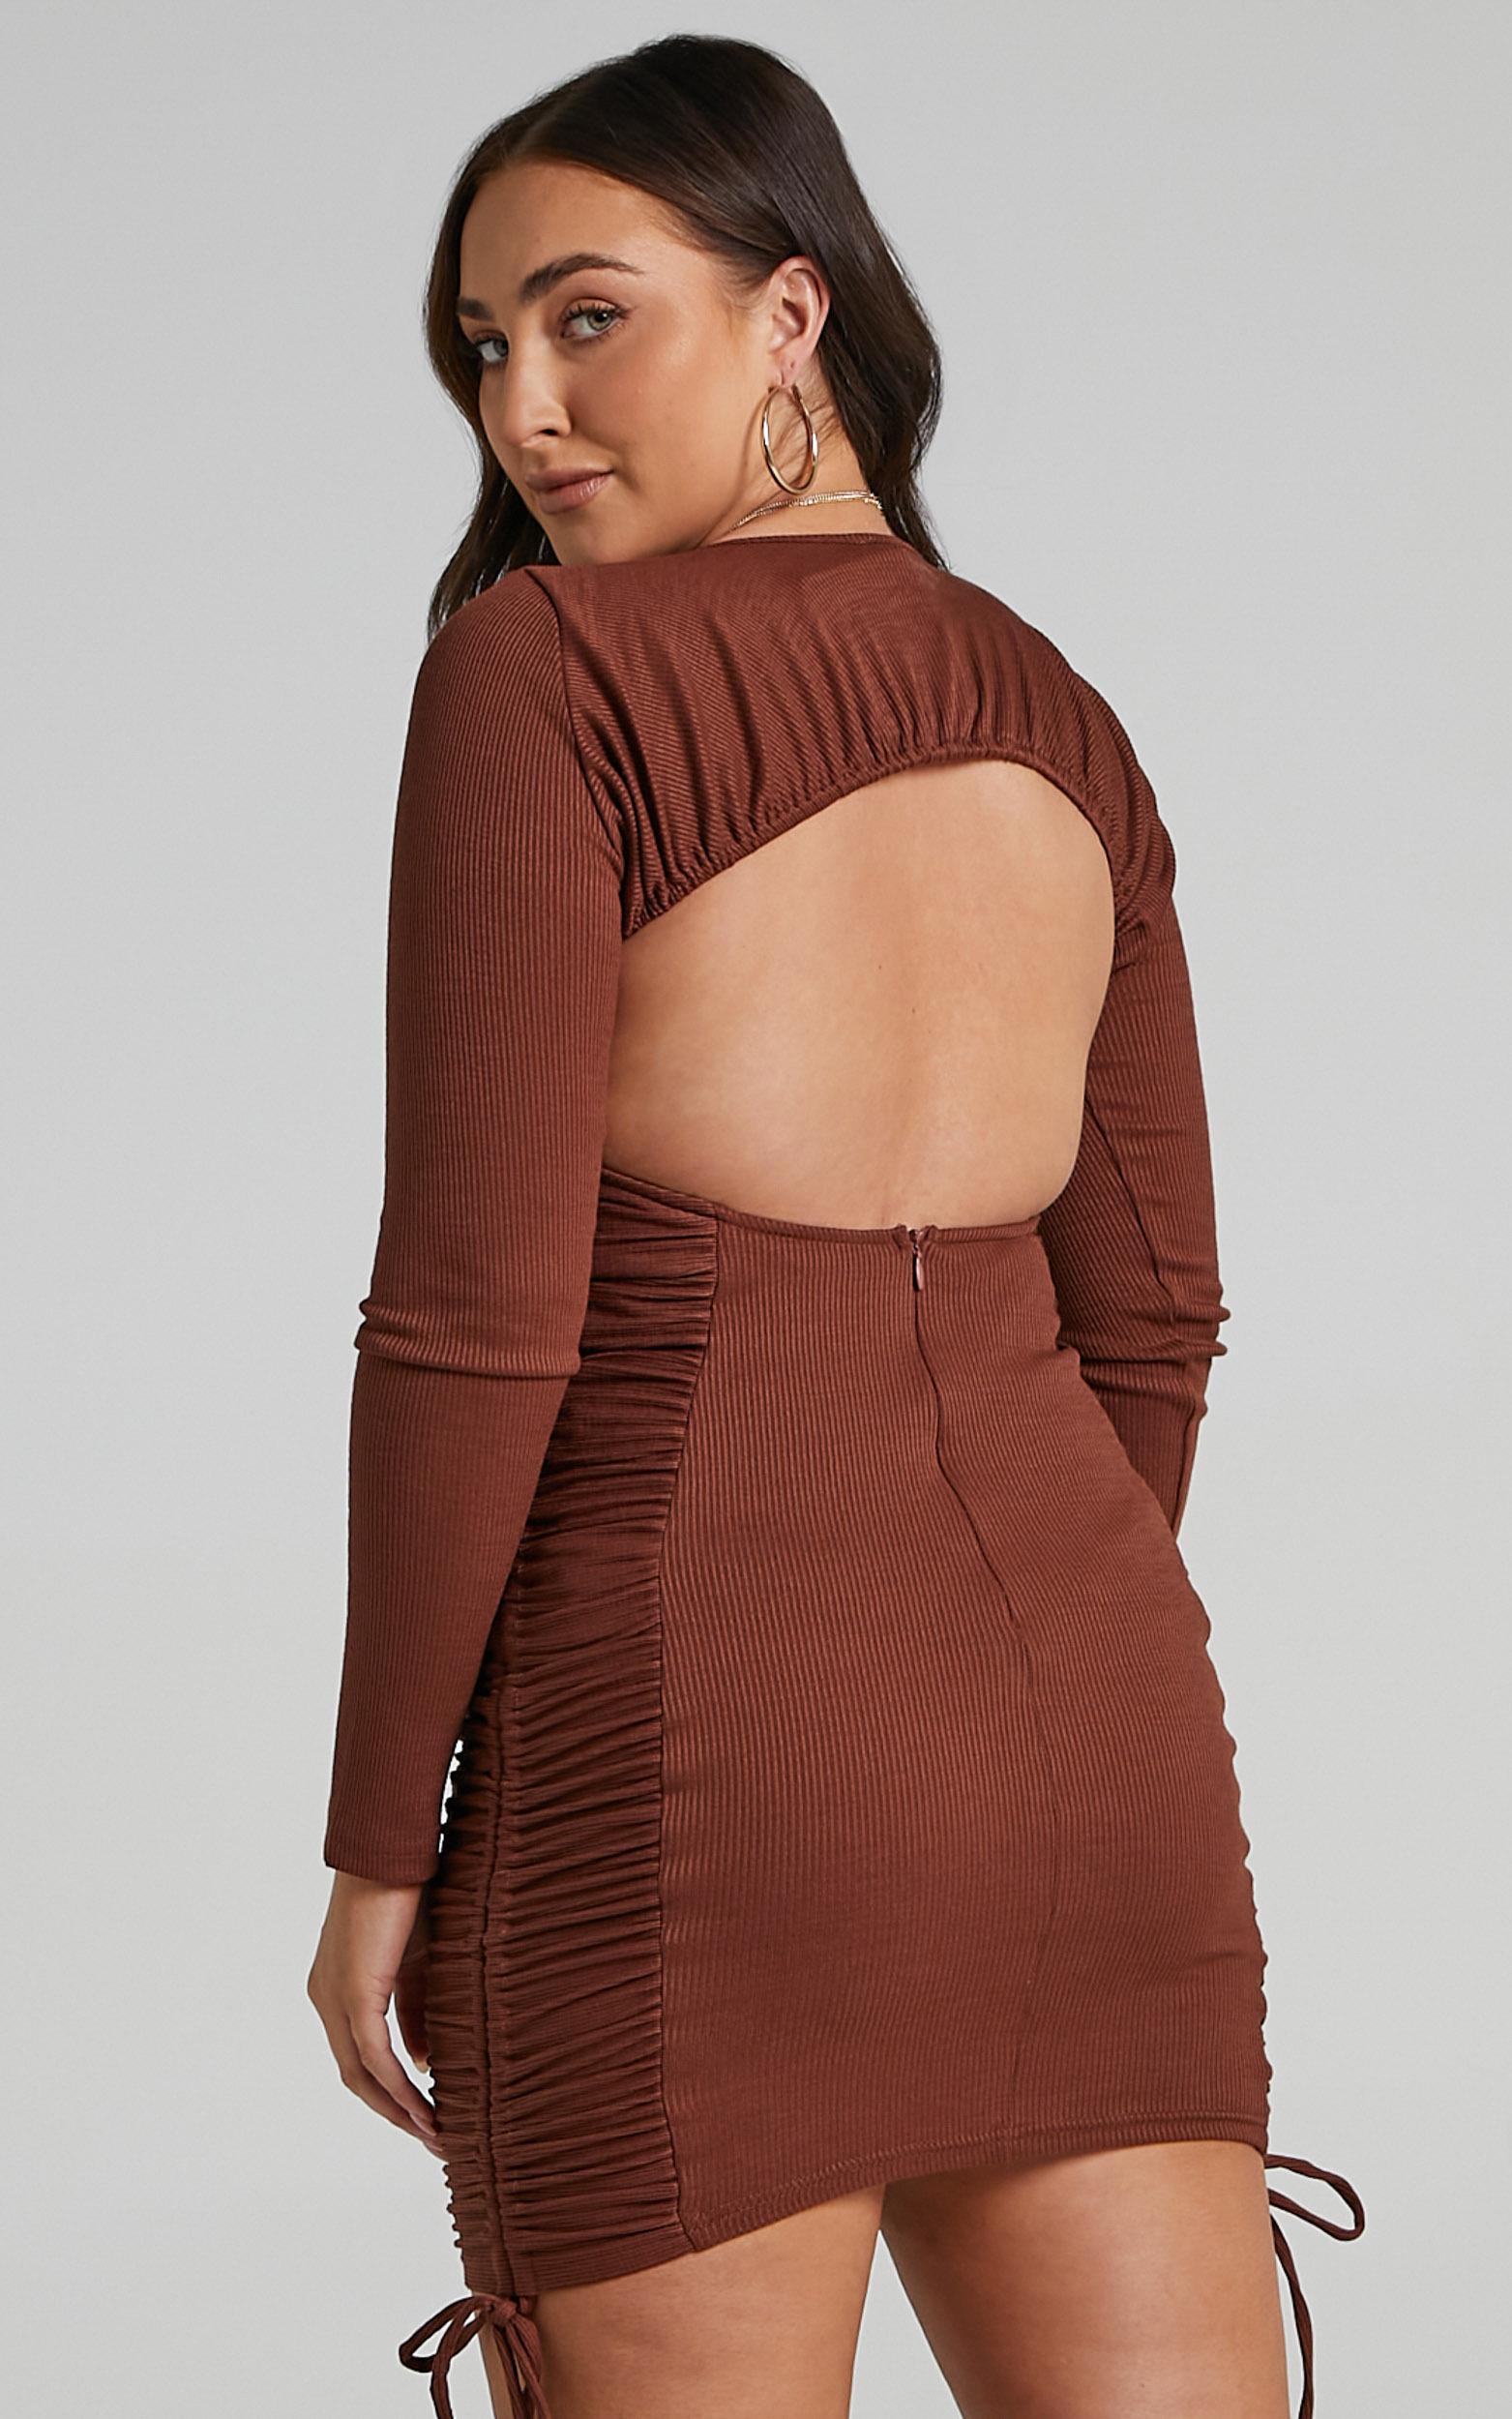 Brittah Dress in Chocolate - 06, BRN1, hi-res image number null